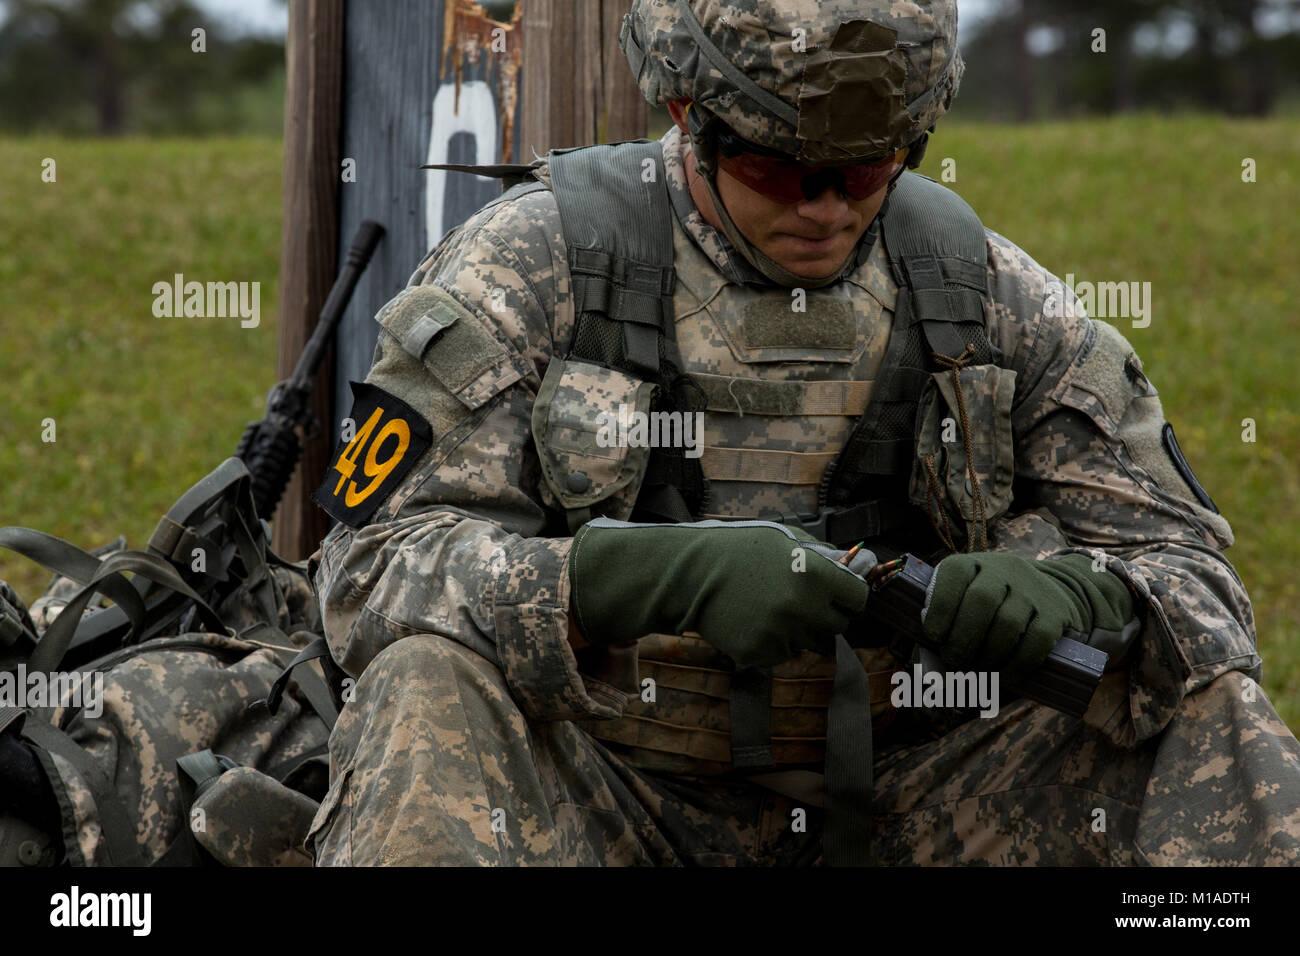 U S Army Sgt 1st Class Stock Photos Amp U S Army Sgt 1st